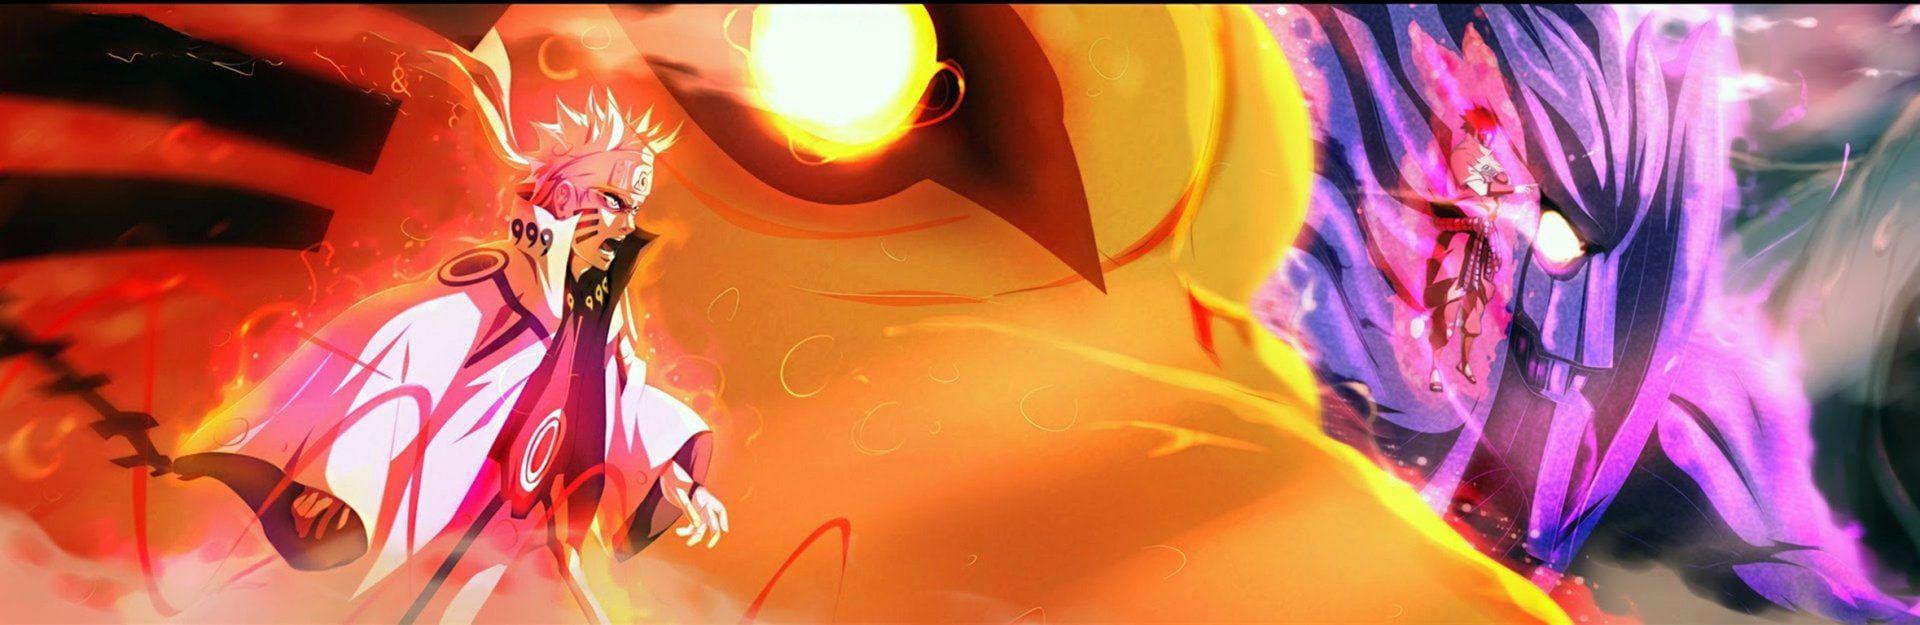 Naruto Wallpaper Hd Resolution On Wallpaper 1080p Hd Papel De